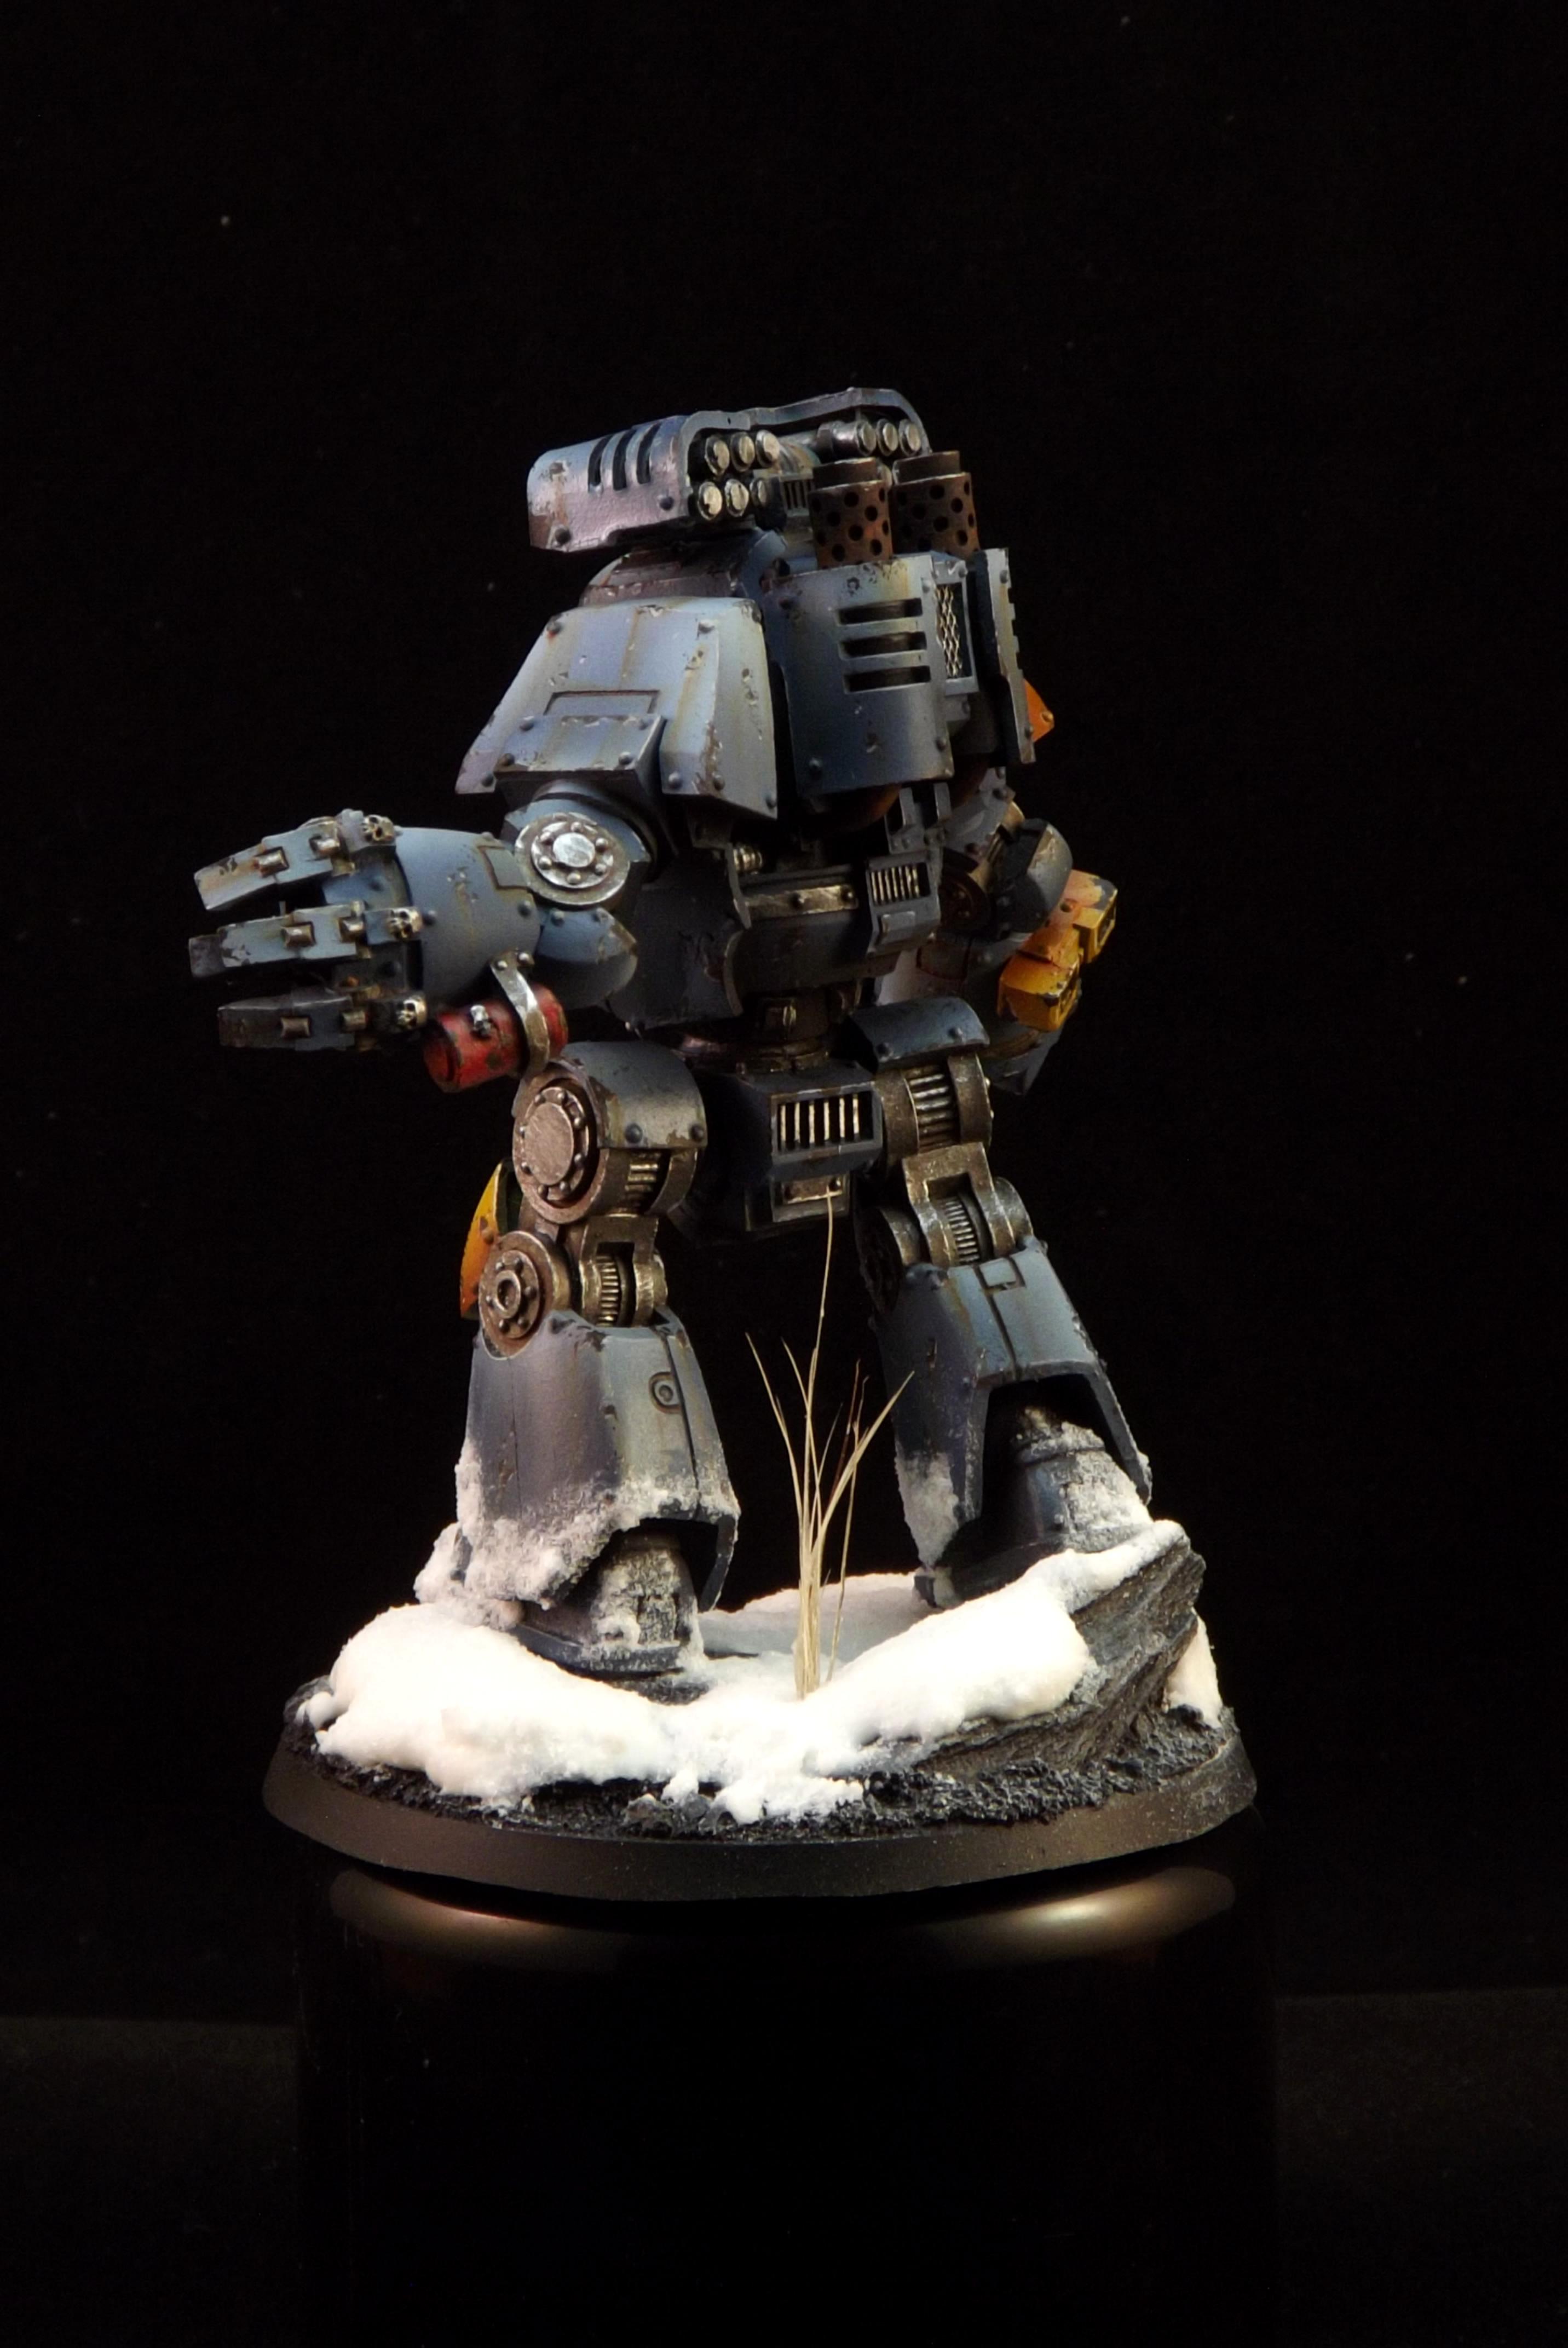 Contemptor, Grey, Snow, Space, Warhammer 40,000, Warhammer Fantasy, Wolves, Yellow